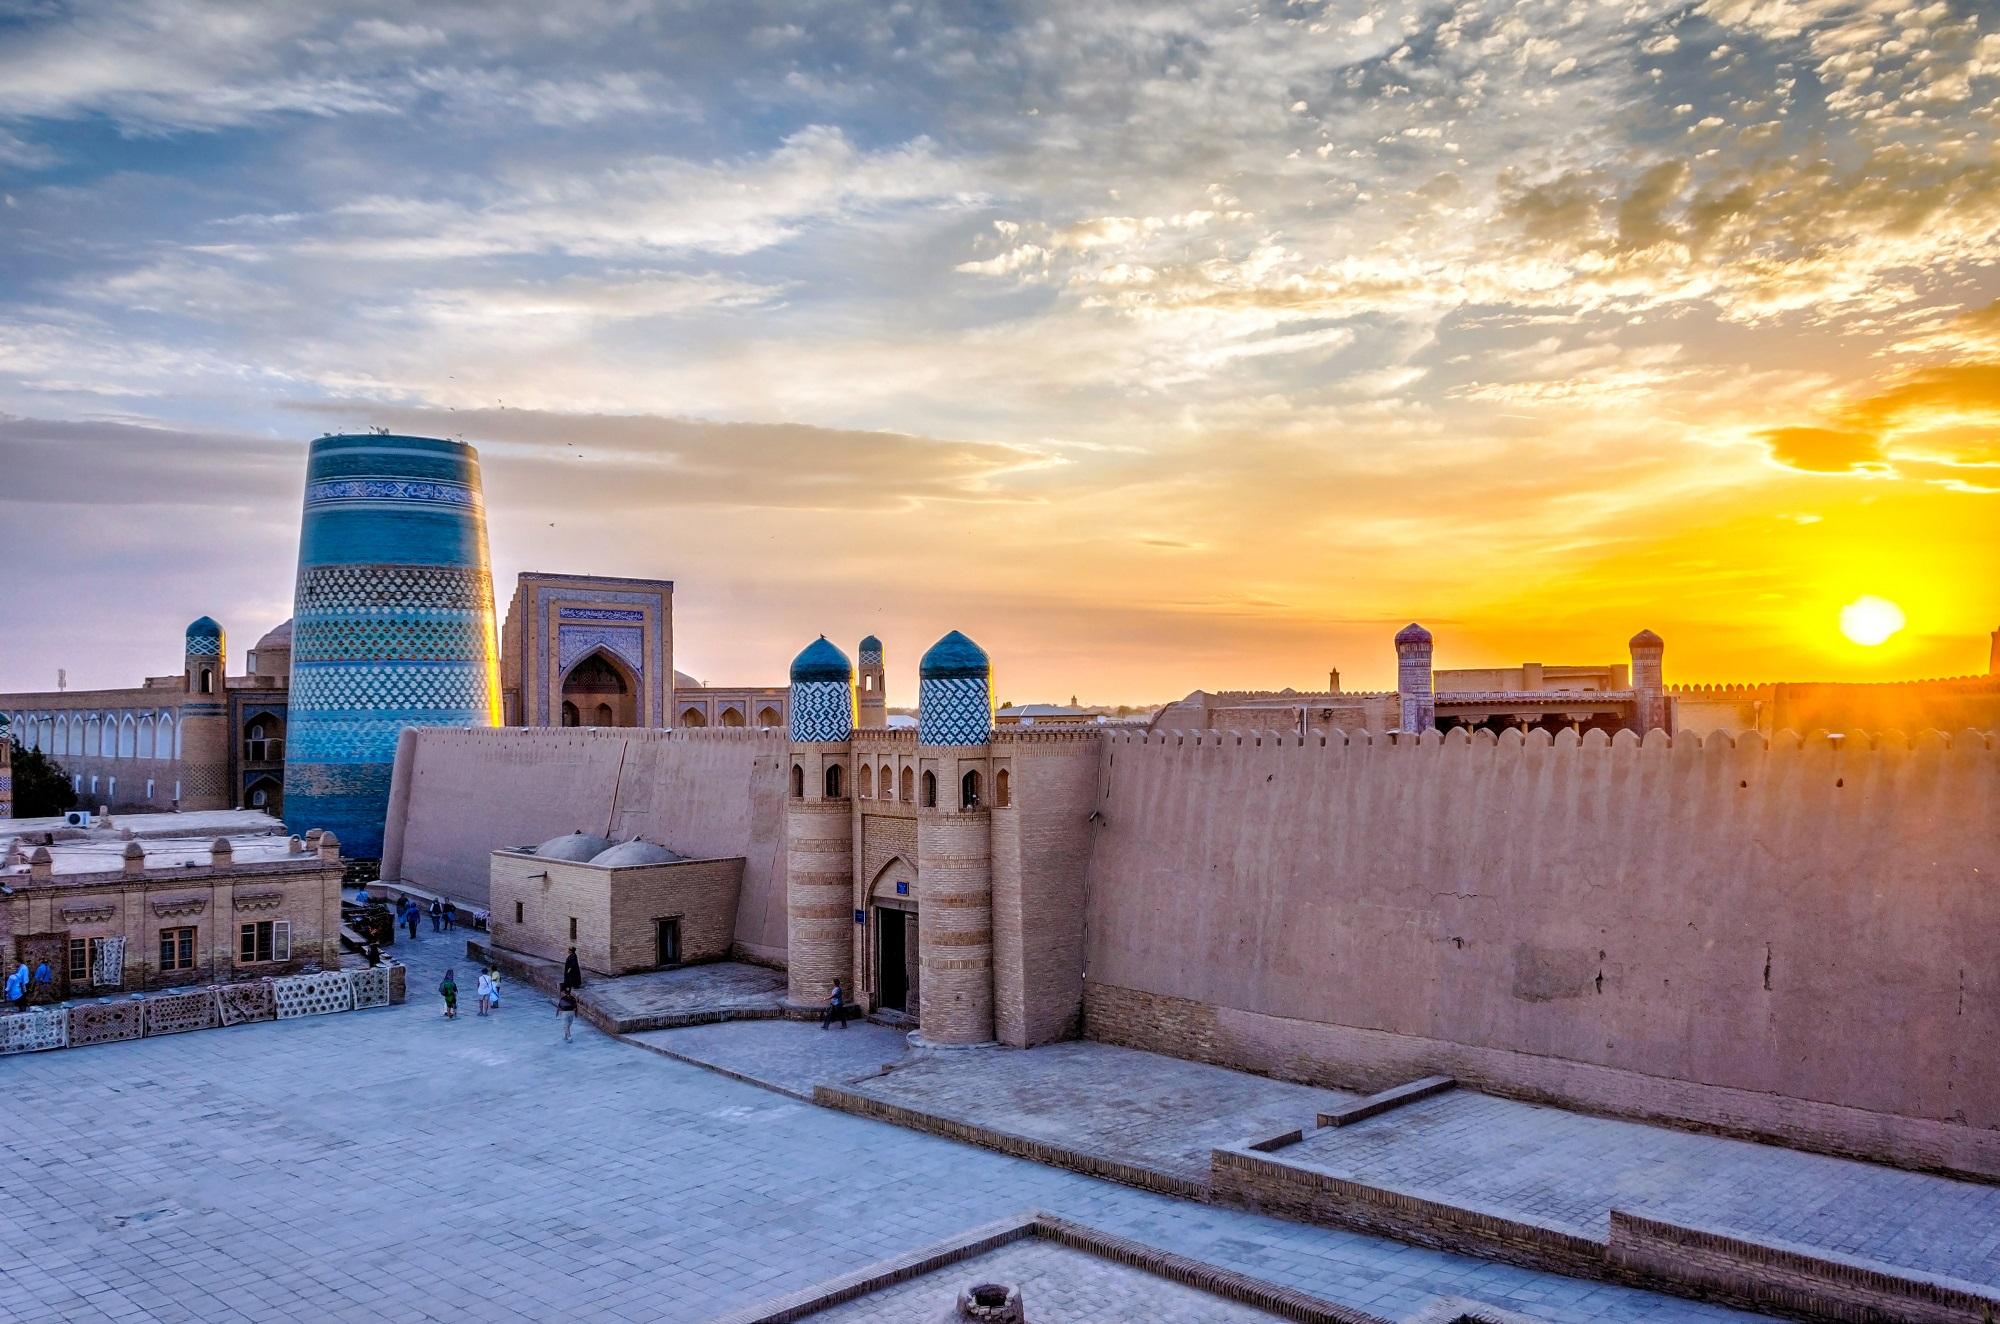 Old city wall and minaret at sunset, Khiva old town, Uzbekistan